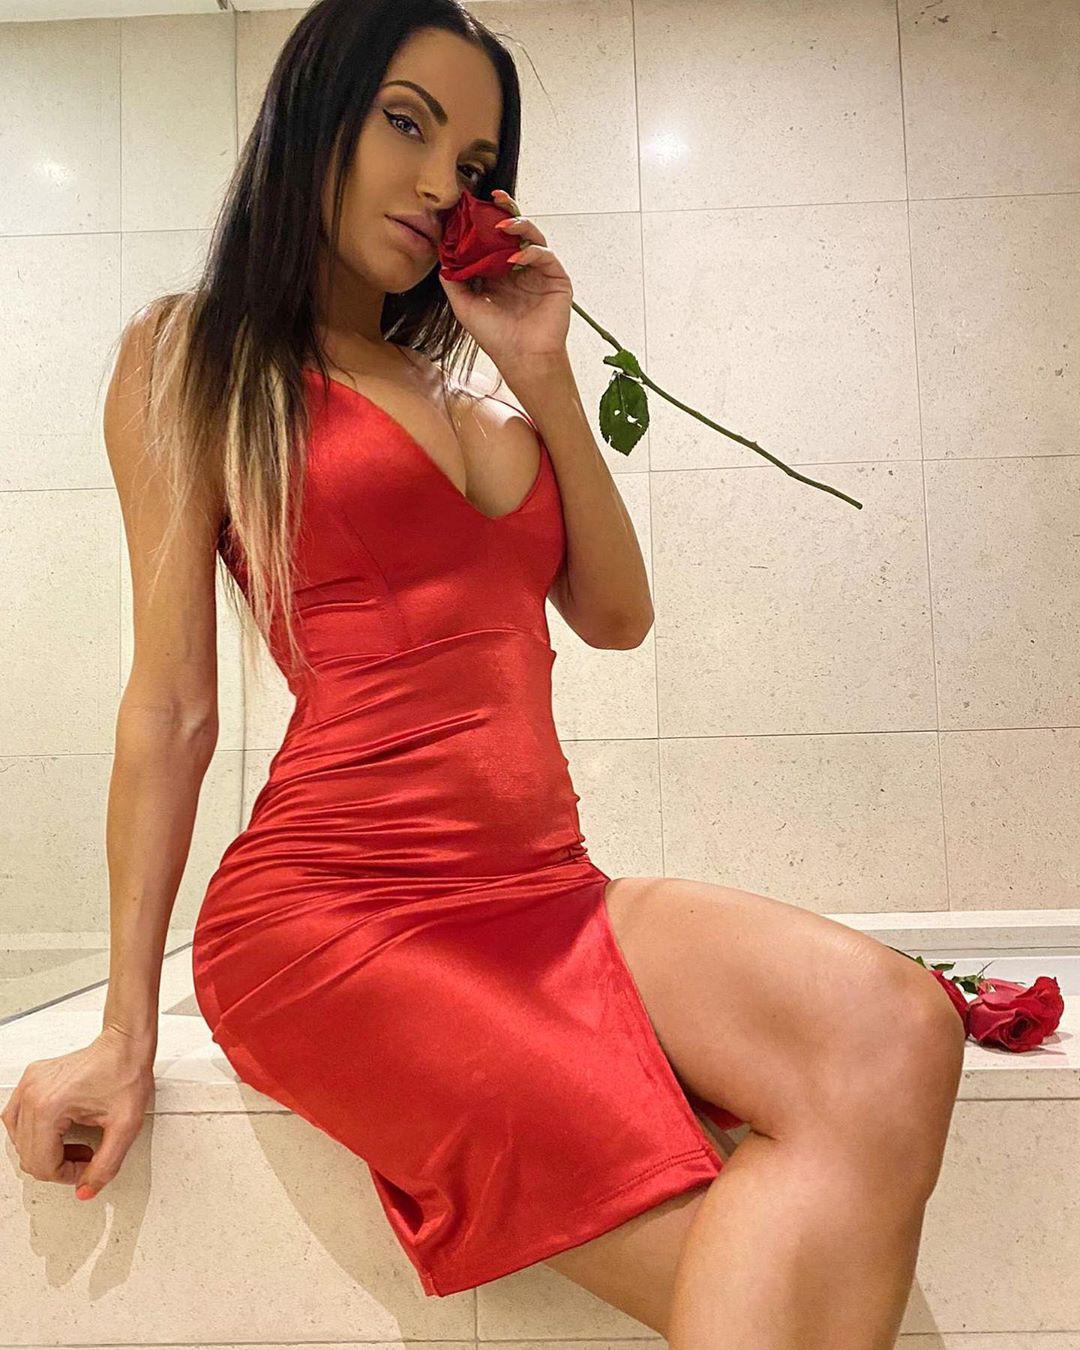 Nienna Jade hot legs, fine legs, Beautiful Lips